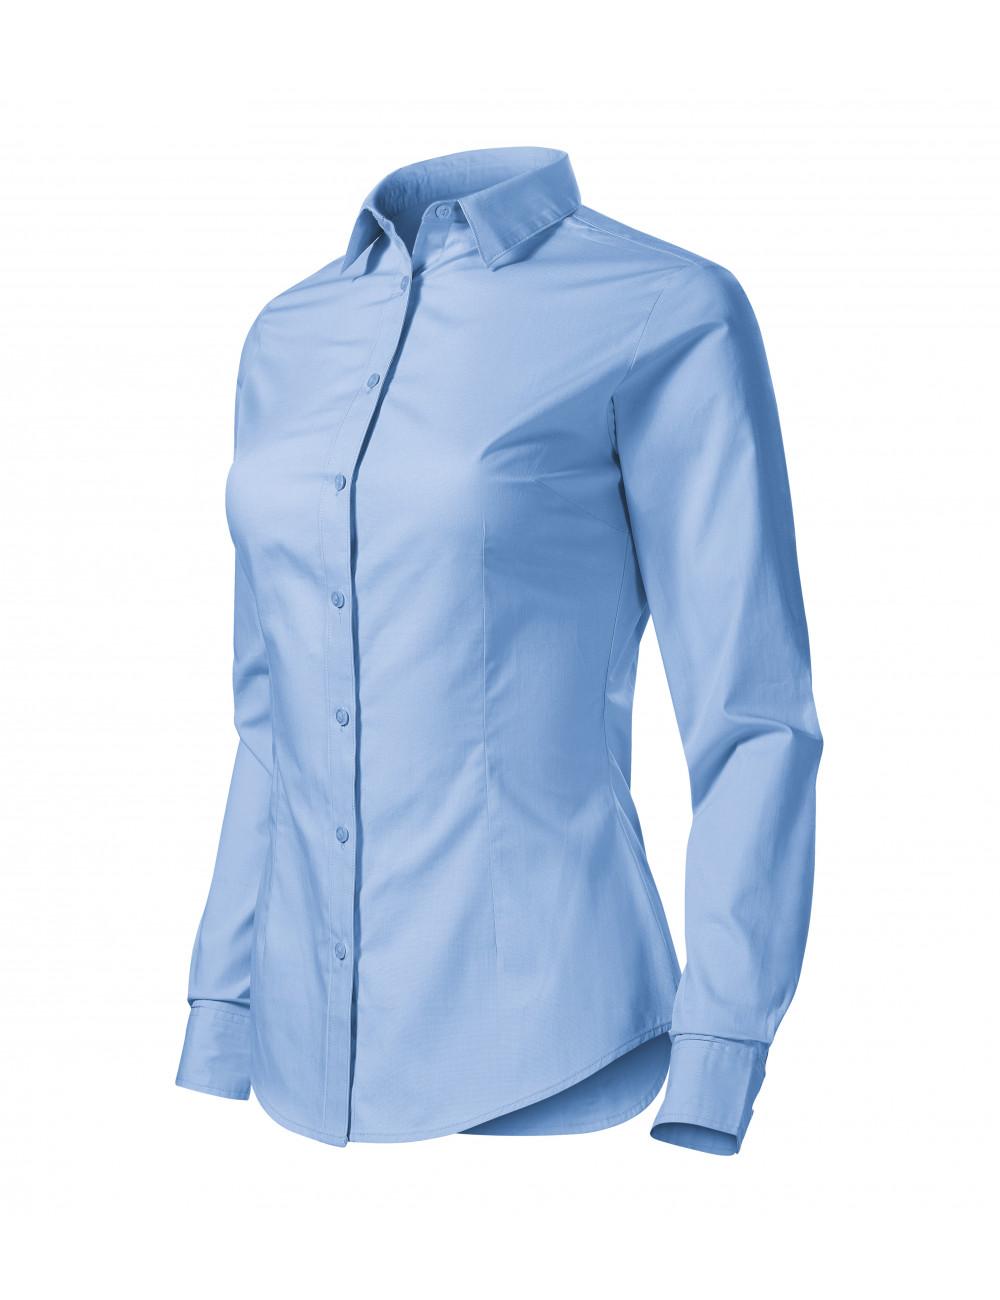 Adler MALFINI Koszula damska Style LS 229 błękitny